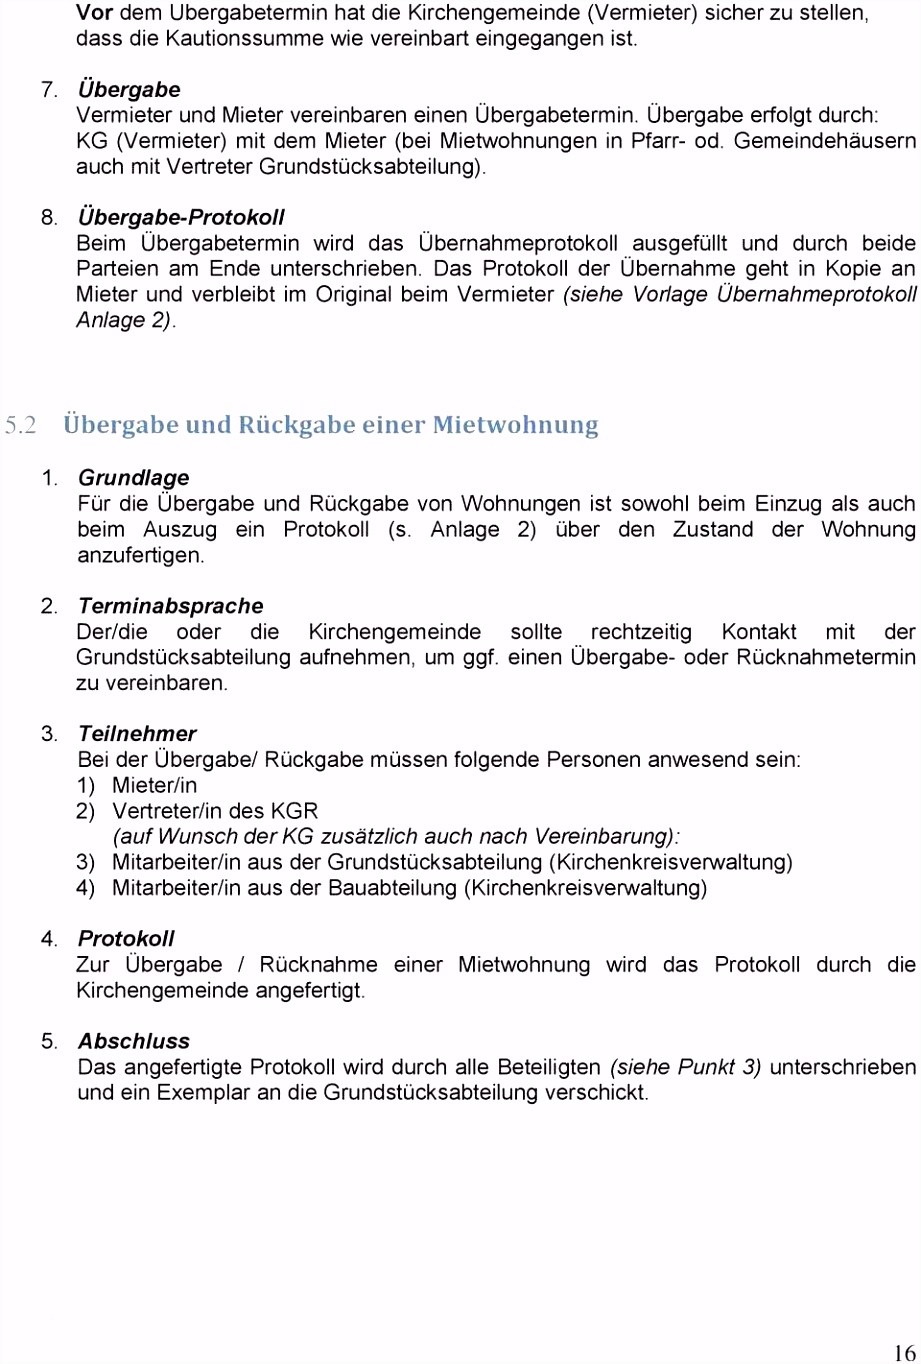 17 bautagesbericht pdf